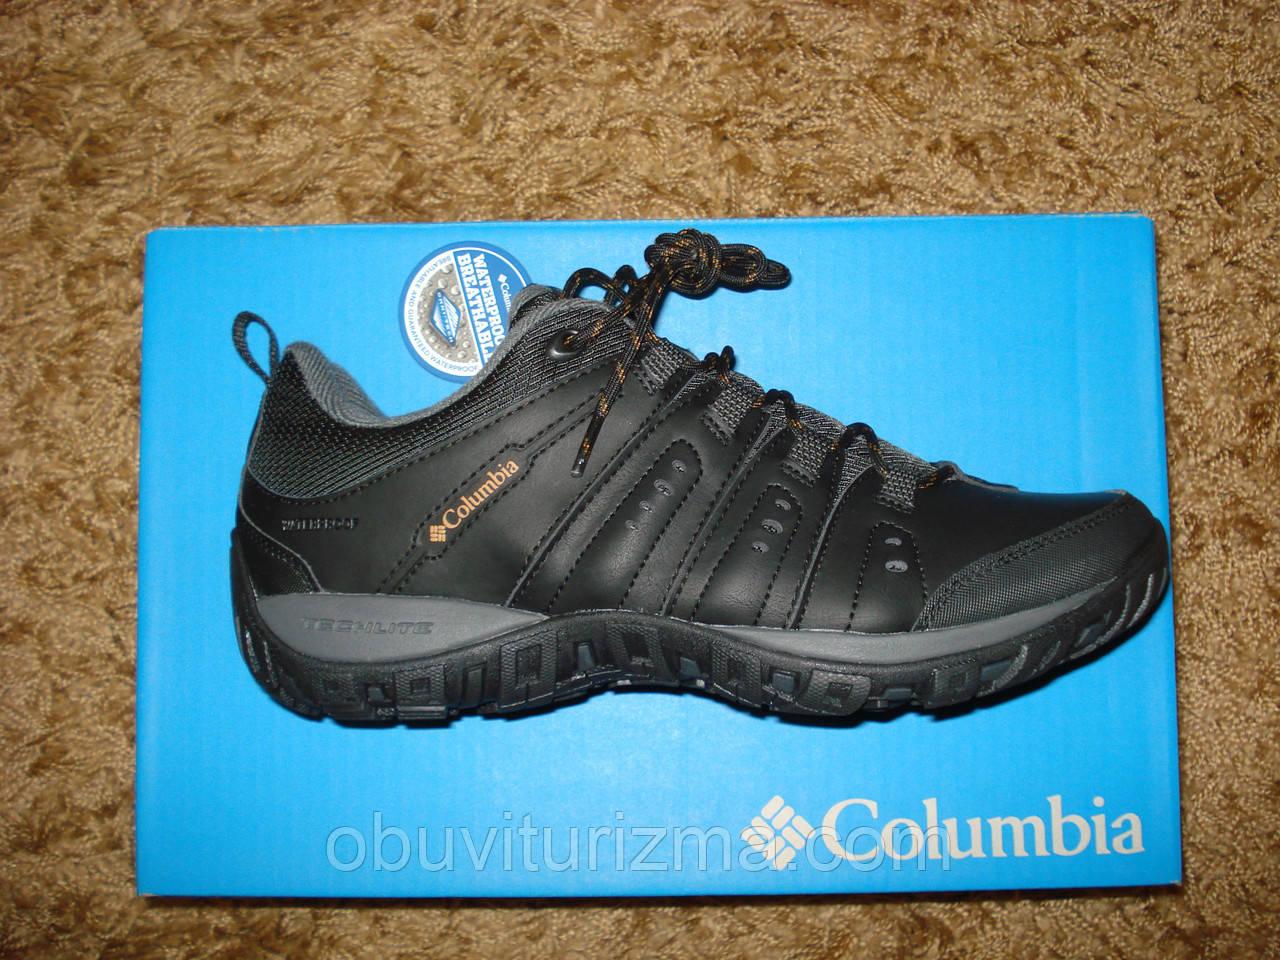 9c34ddcc9868 Полуботинки Columbia Peakfreak™ Nomad Waterproof  (8 8.5 9 9.5 10 10.5 11 11.5) — в Категории